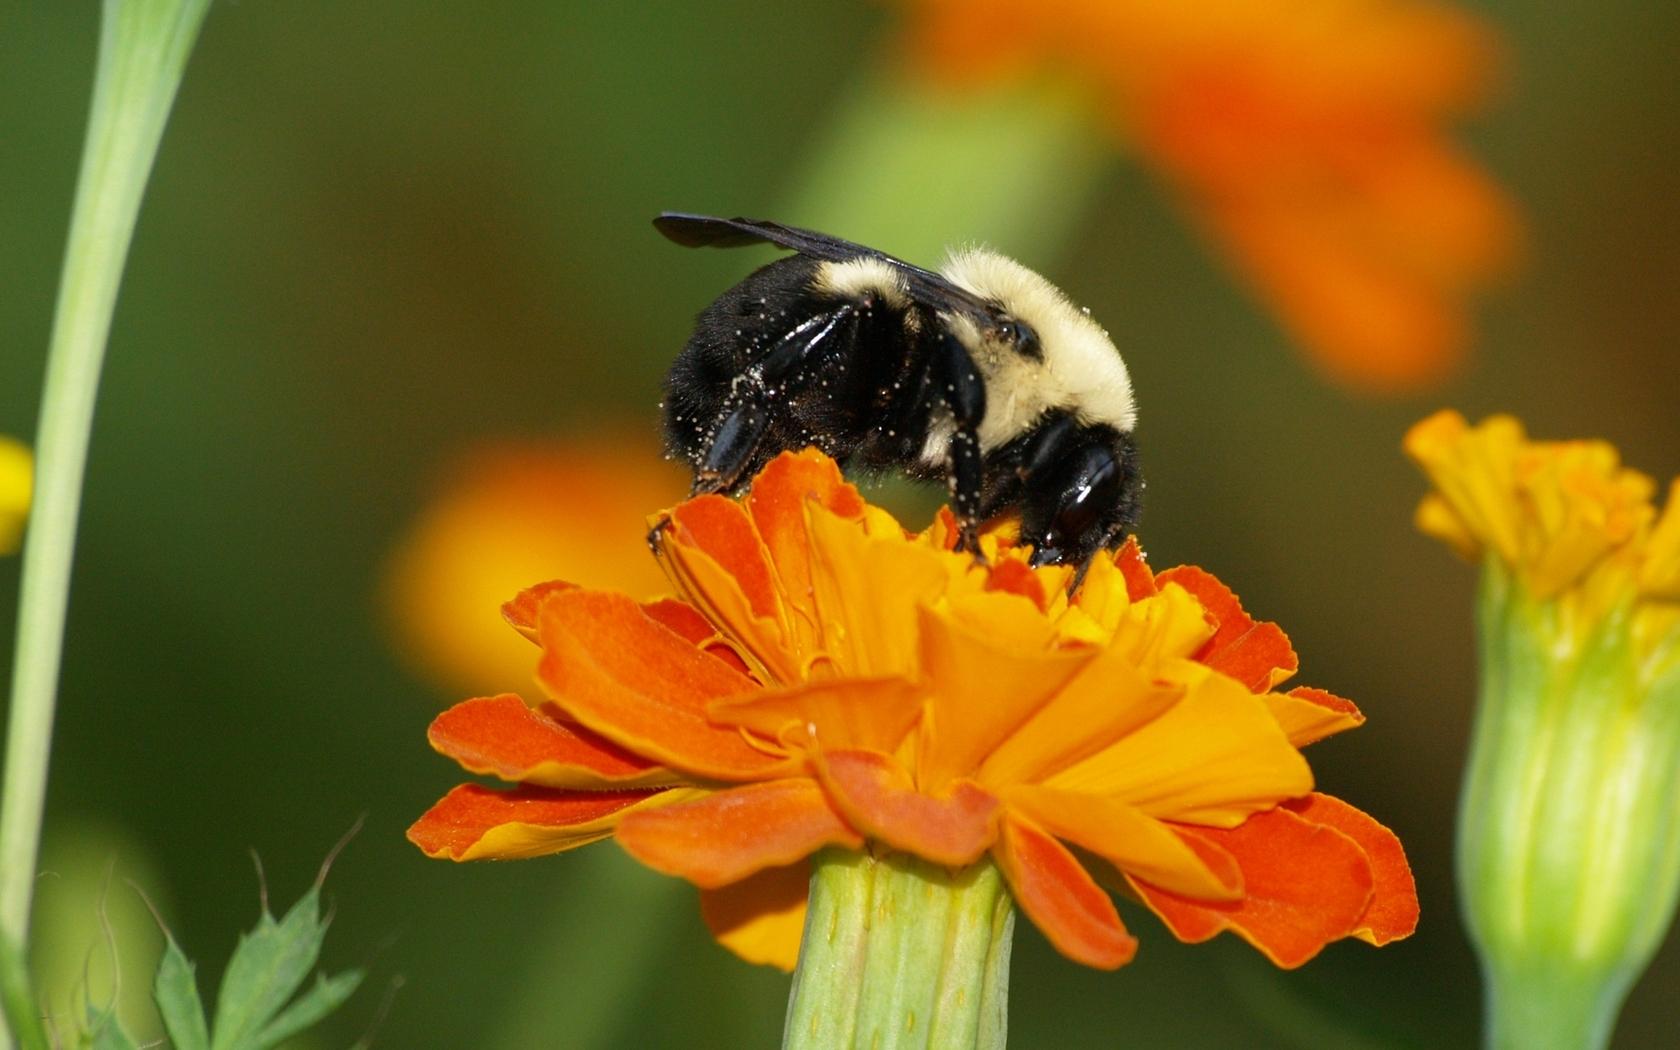 Marigold Bumblebee wallpaper 35202 1680x1050